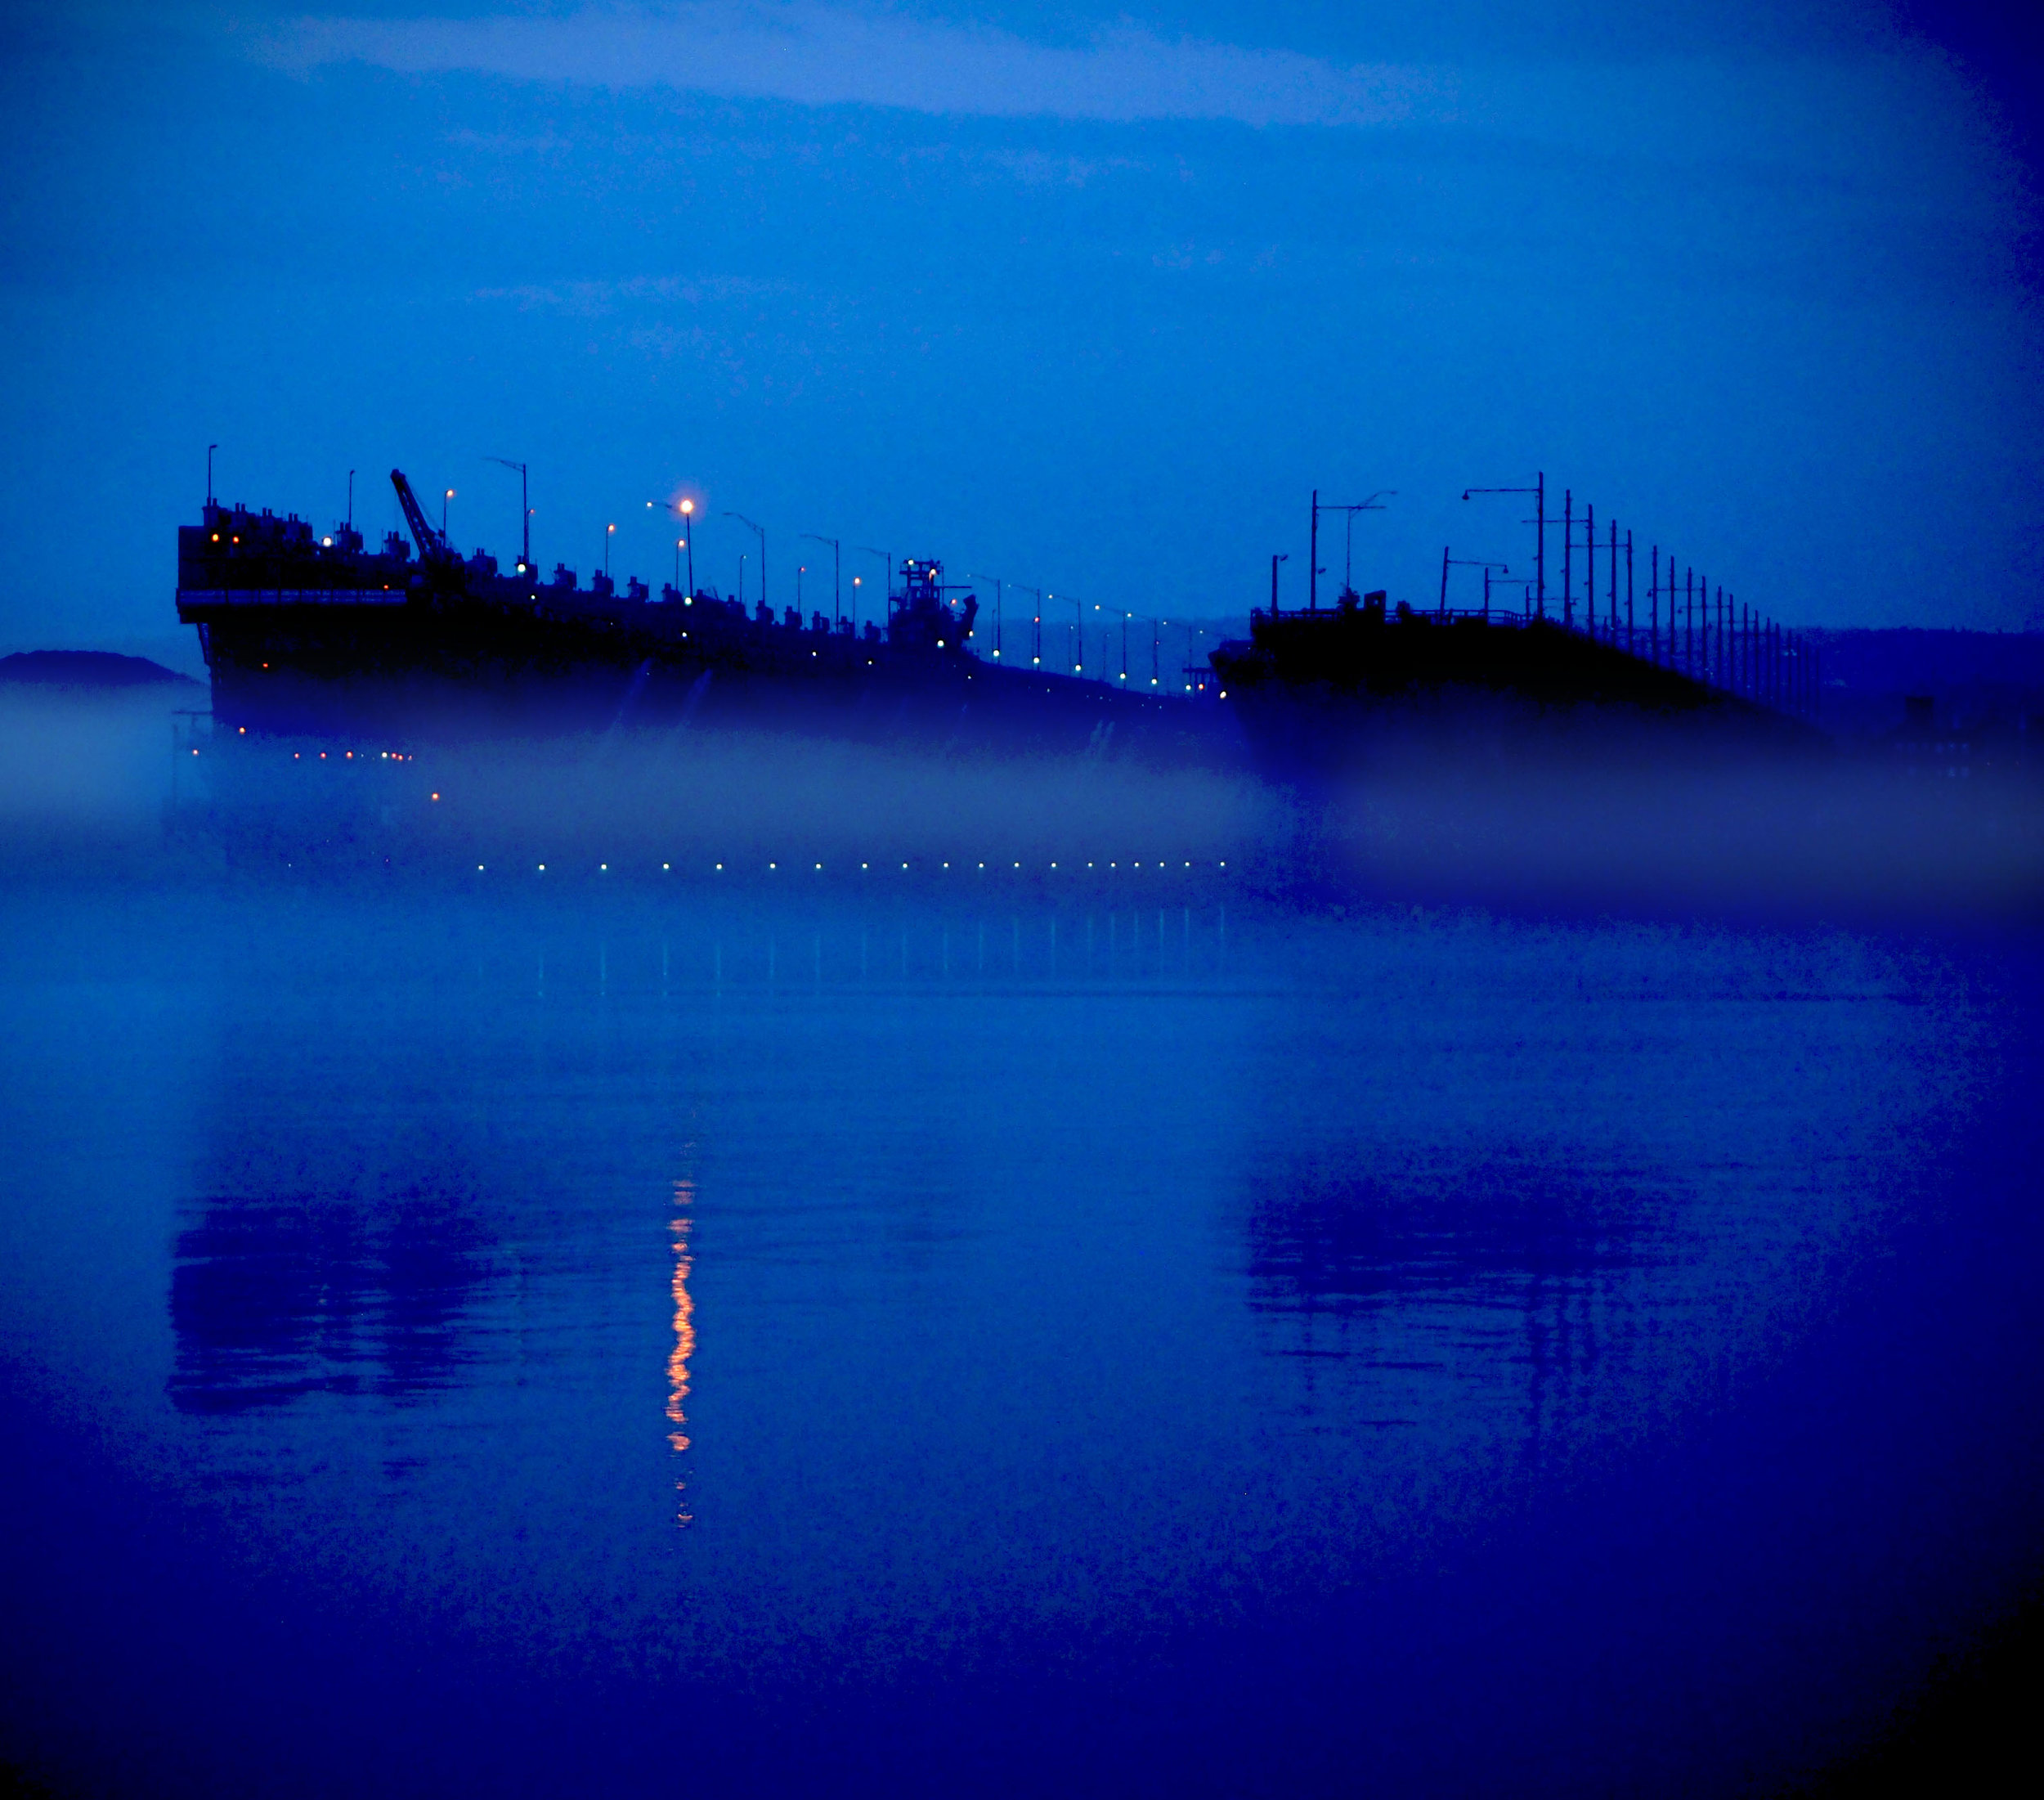 P6282603 - Agate Bay Iron Ore Docks